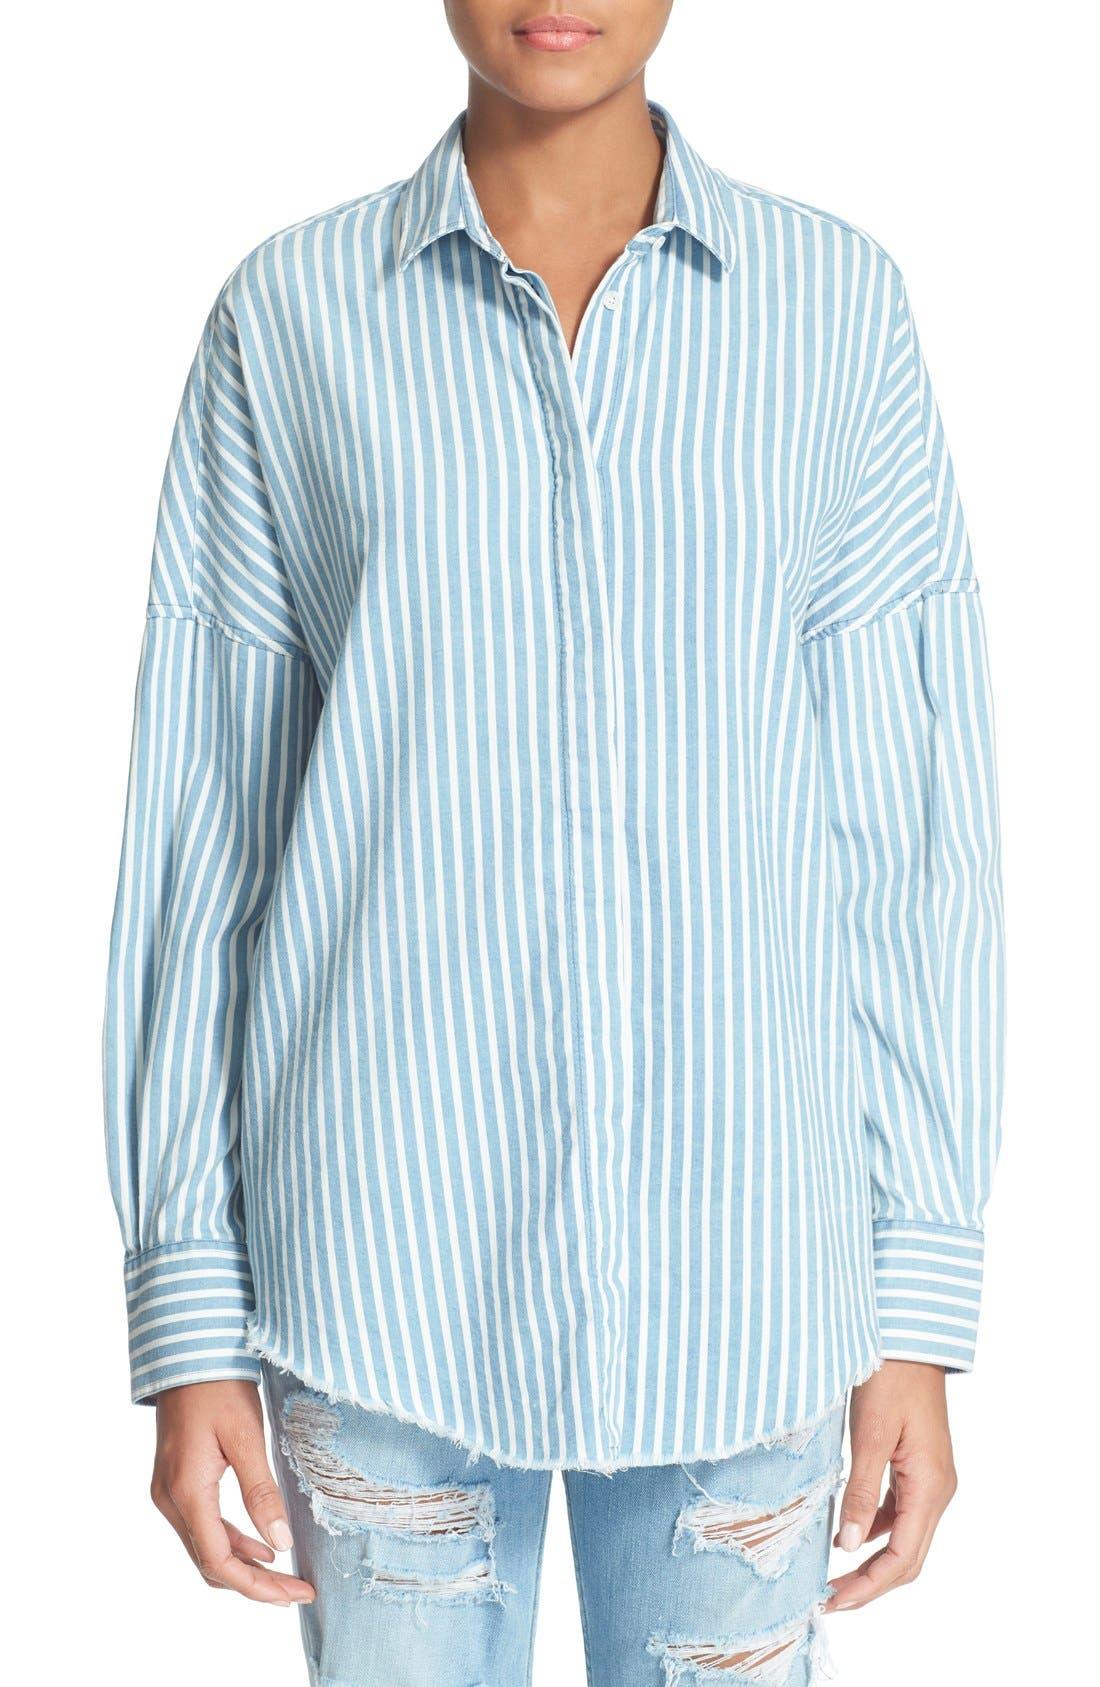 Alternate Image 1 Selected - IRO 'Mia' Stripe Cotton & Modal Shirt